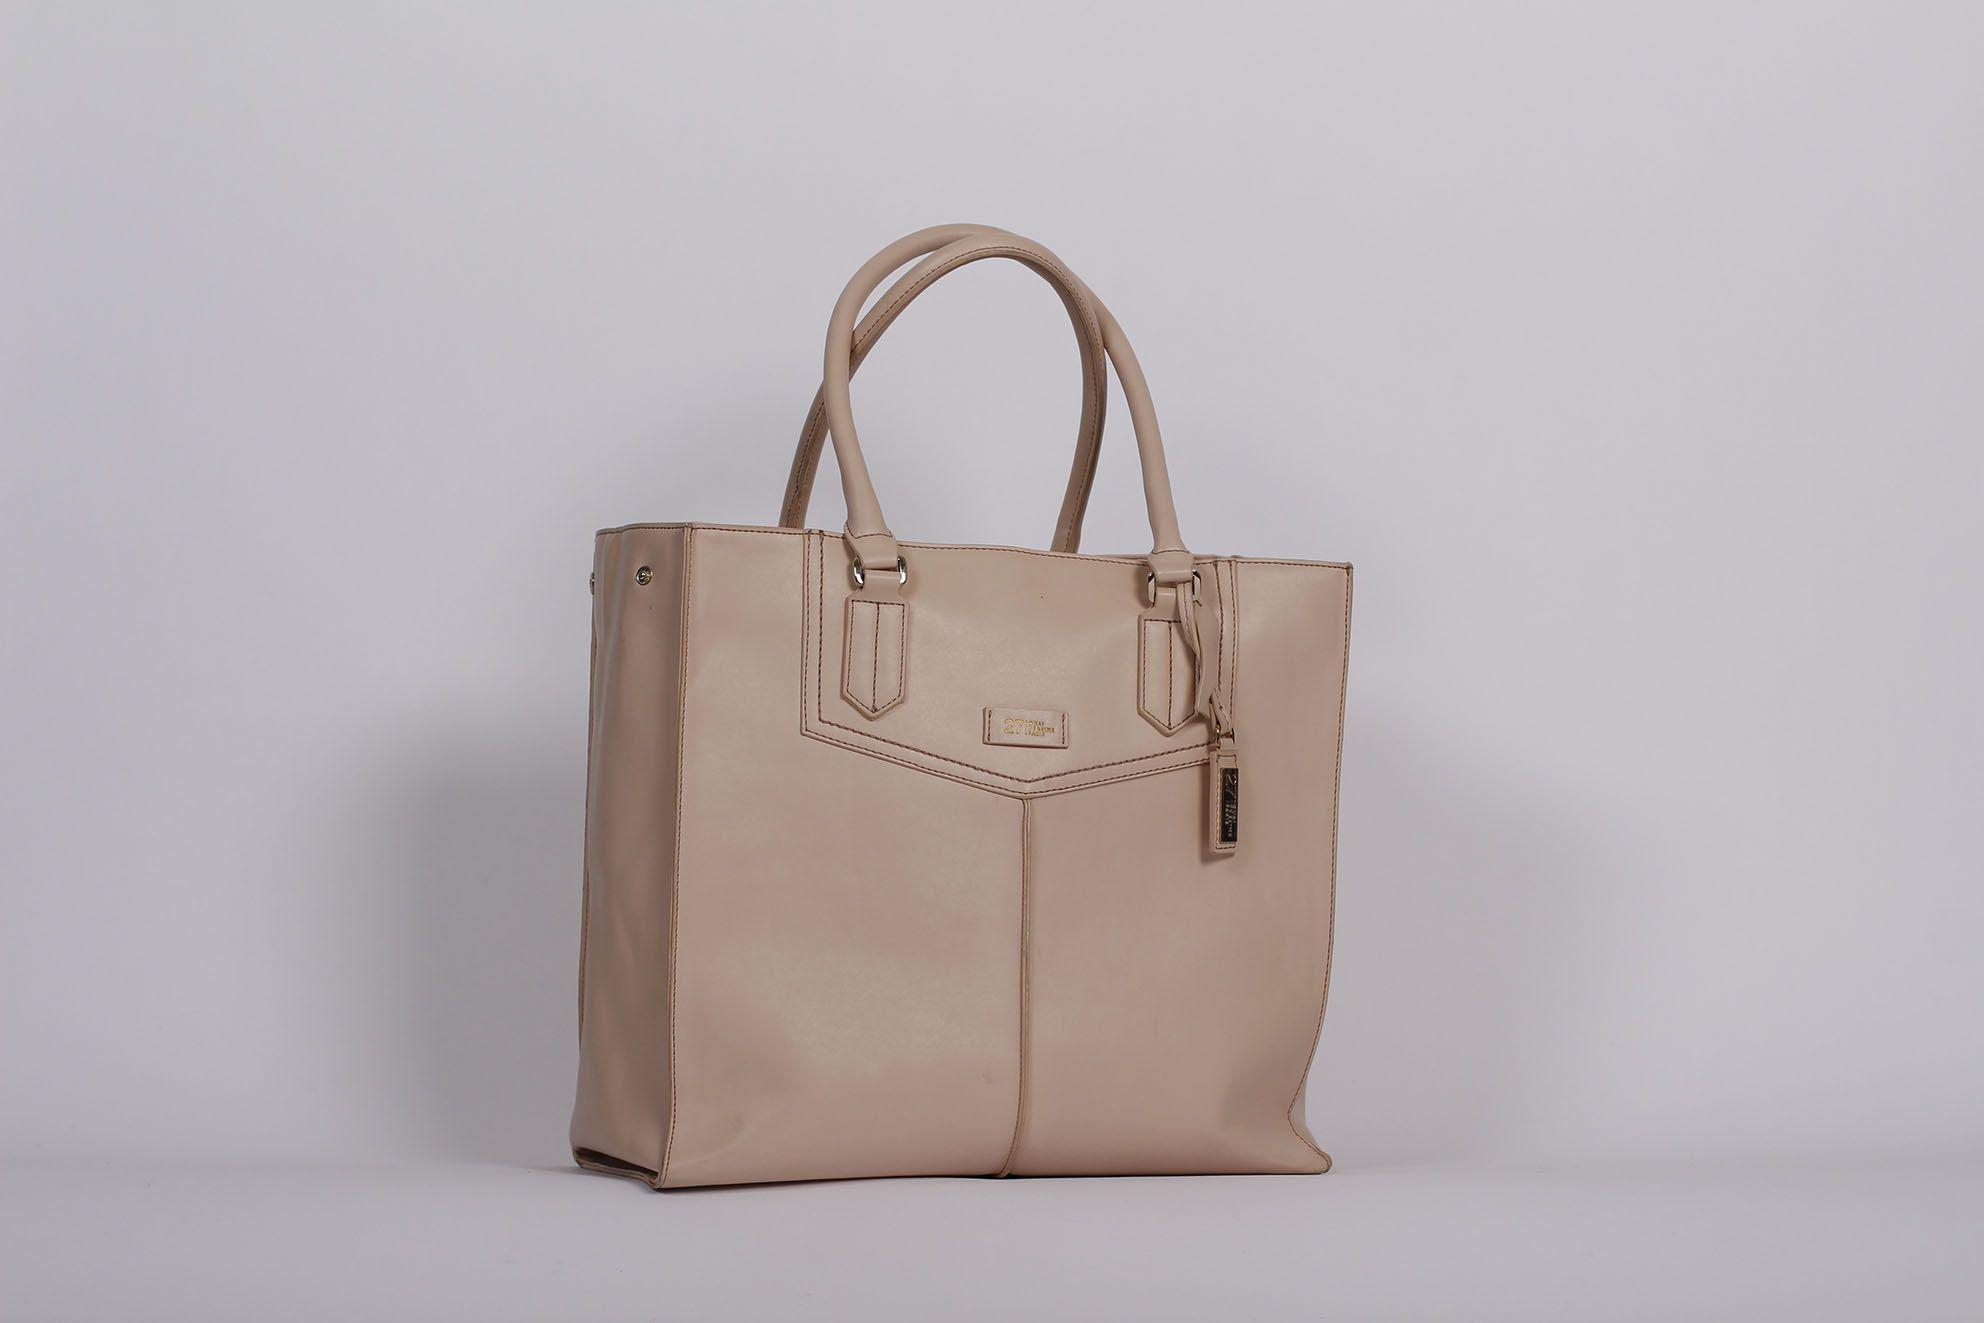 Bag MLSTUDIO for La Halle brand | La Halle design by MLSTUDIO ...